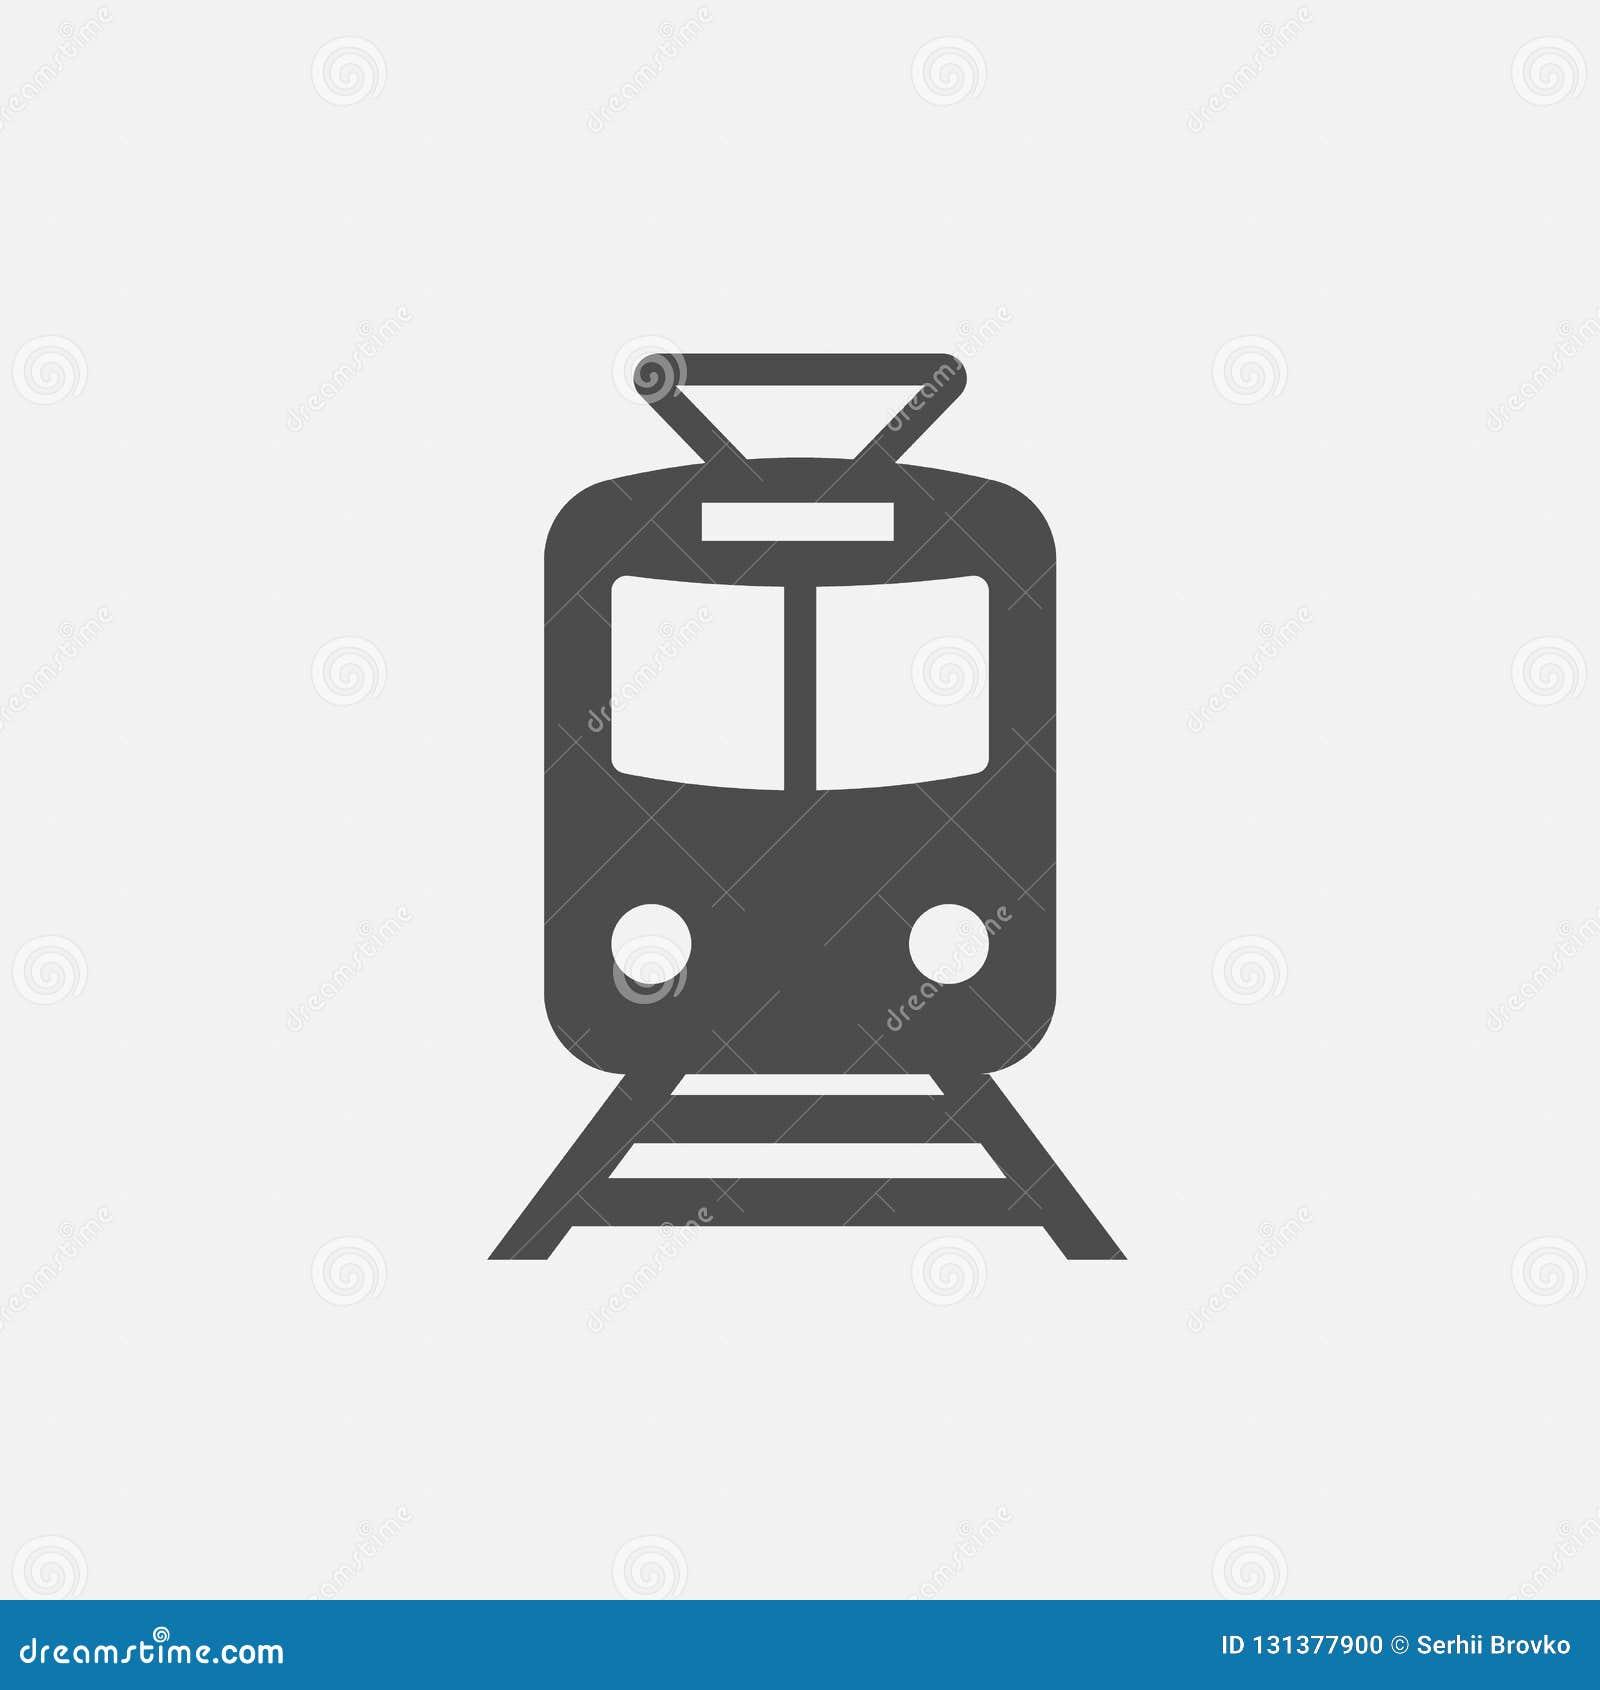 Subway icon. Metro sign. Train symbol. icon isolated on white background. Vector illustration.